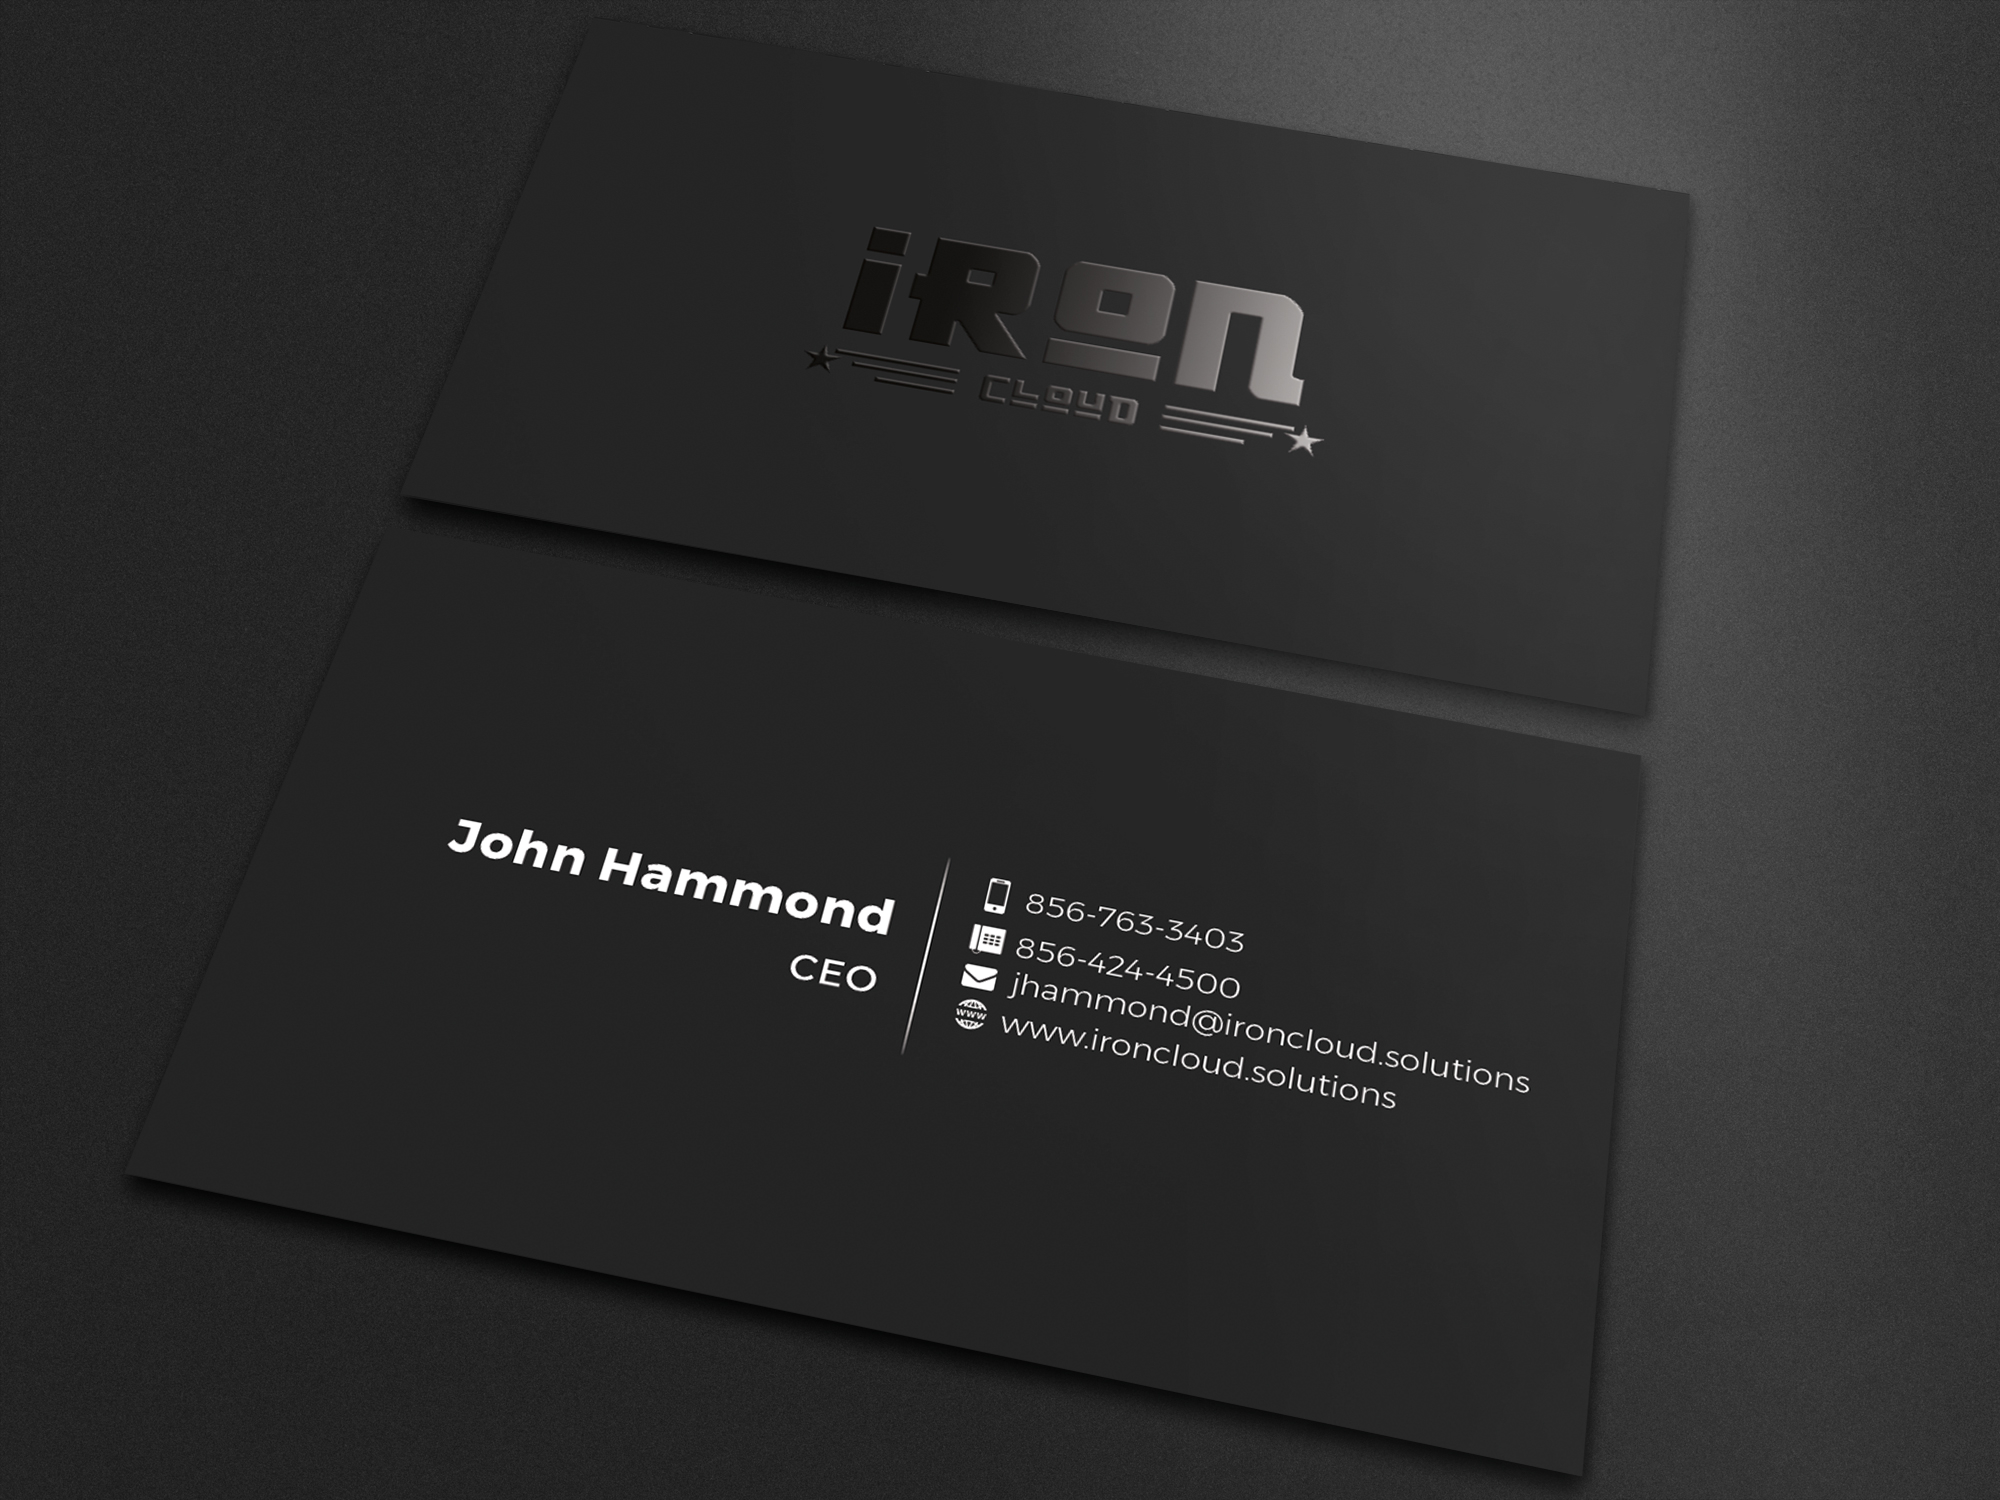 Spot UV Business Card